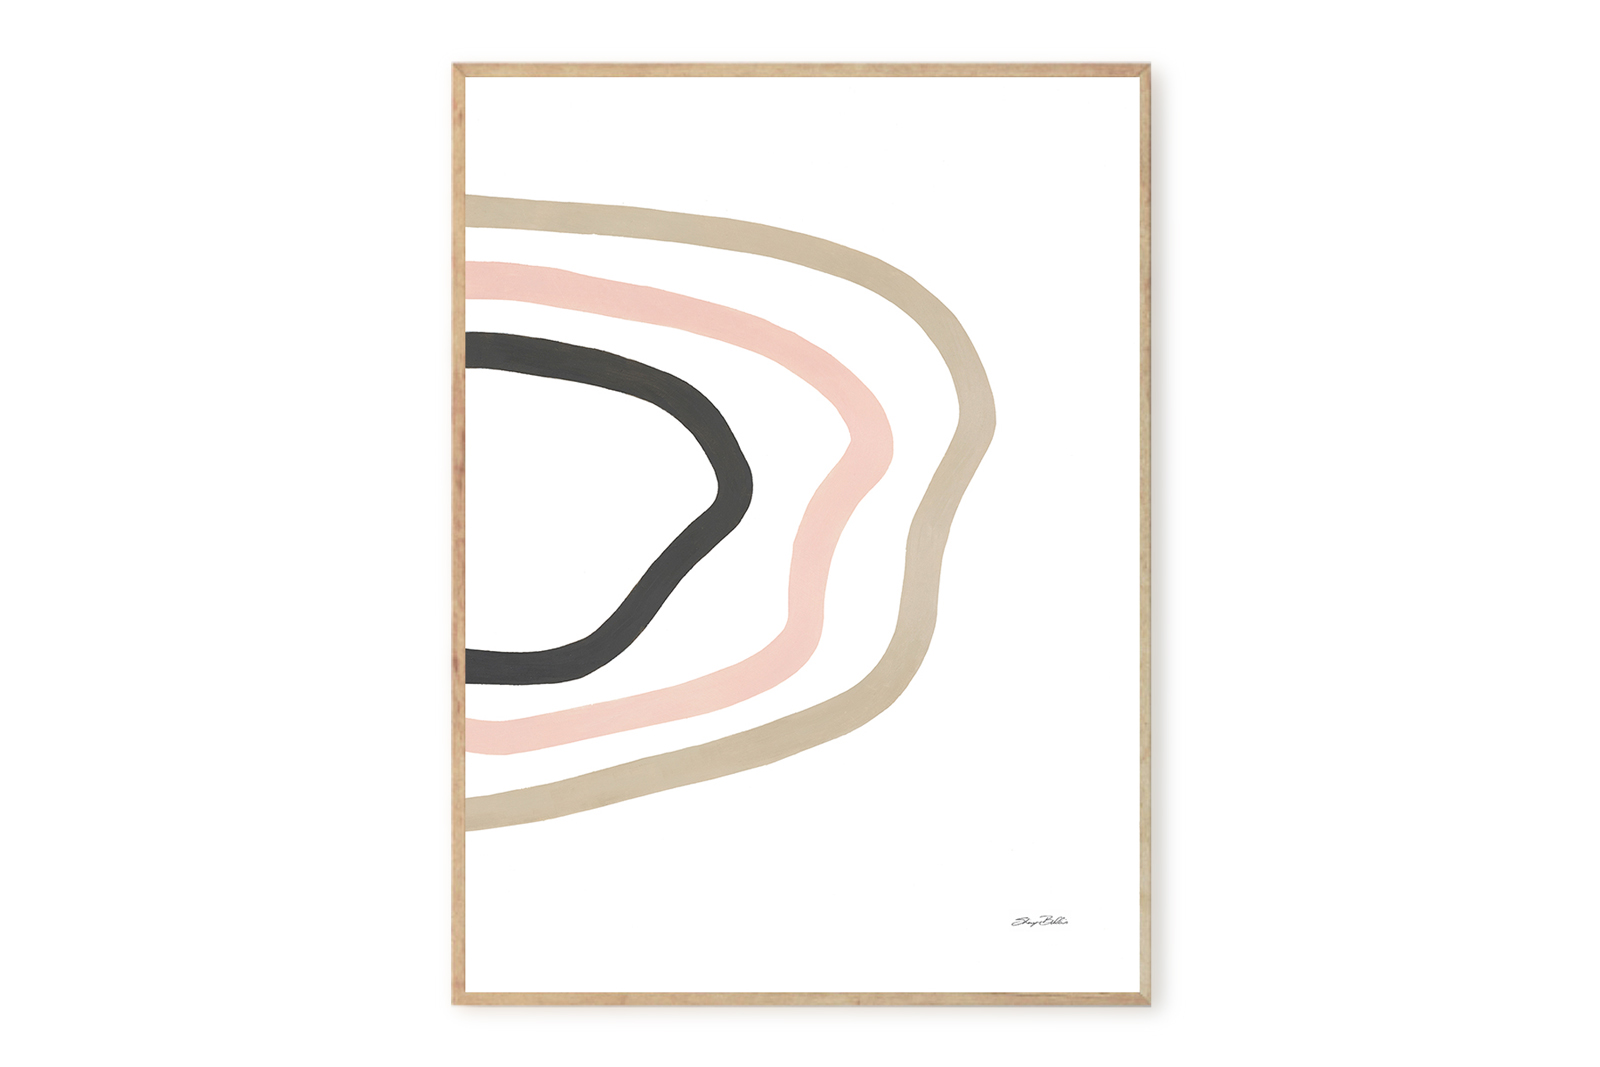 THE POSTER CLUB × Sheryn Bullis ポスター/アートプリント 50×70cm Rythem of a lake【イラスト インテリア 北欧雑貨 おしゃれ 壁掛け 絵画 パネル モダン モノクロ モノトーン デンマーク コペンハーゲン】